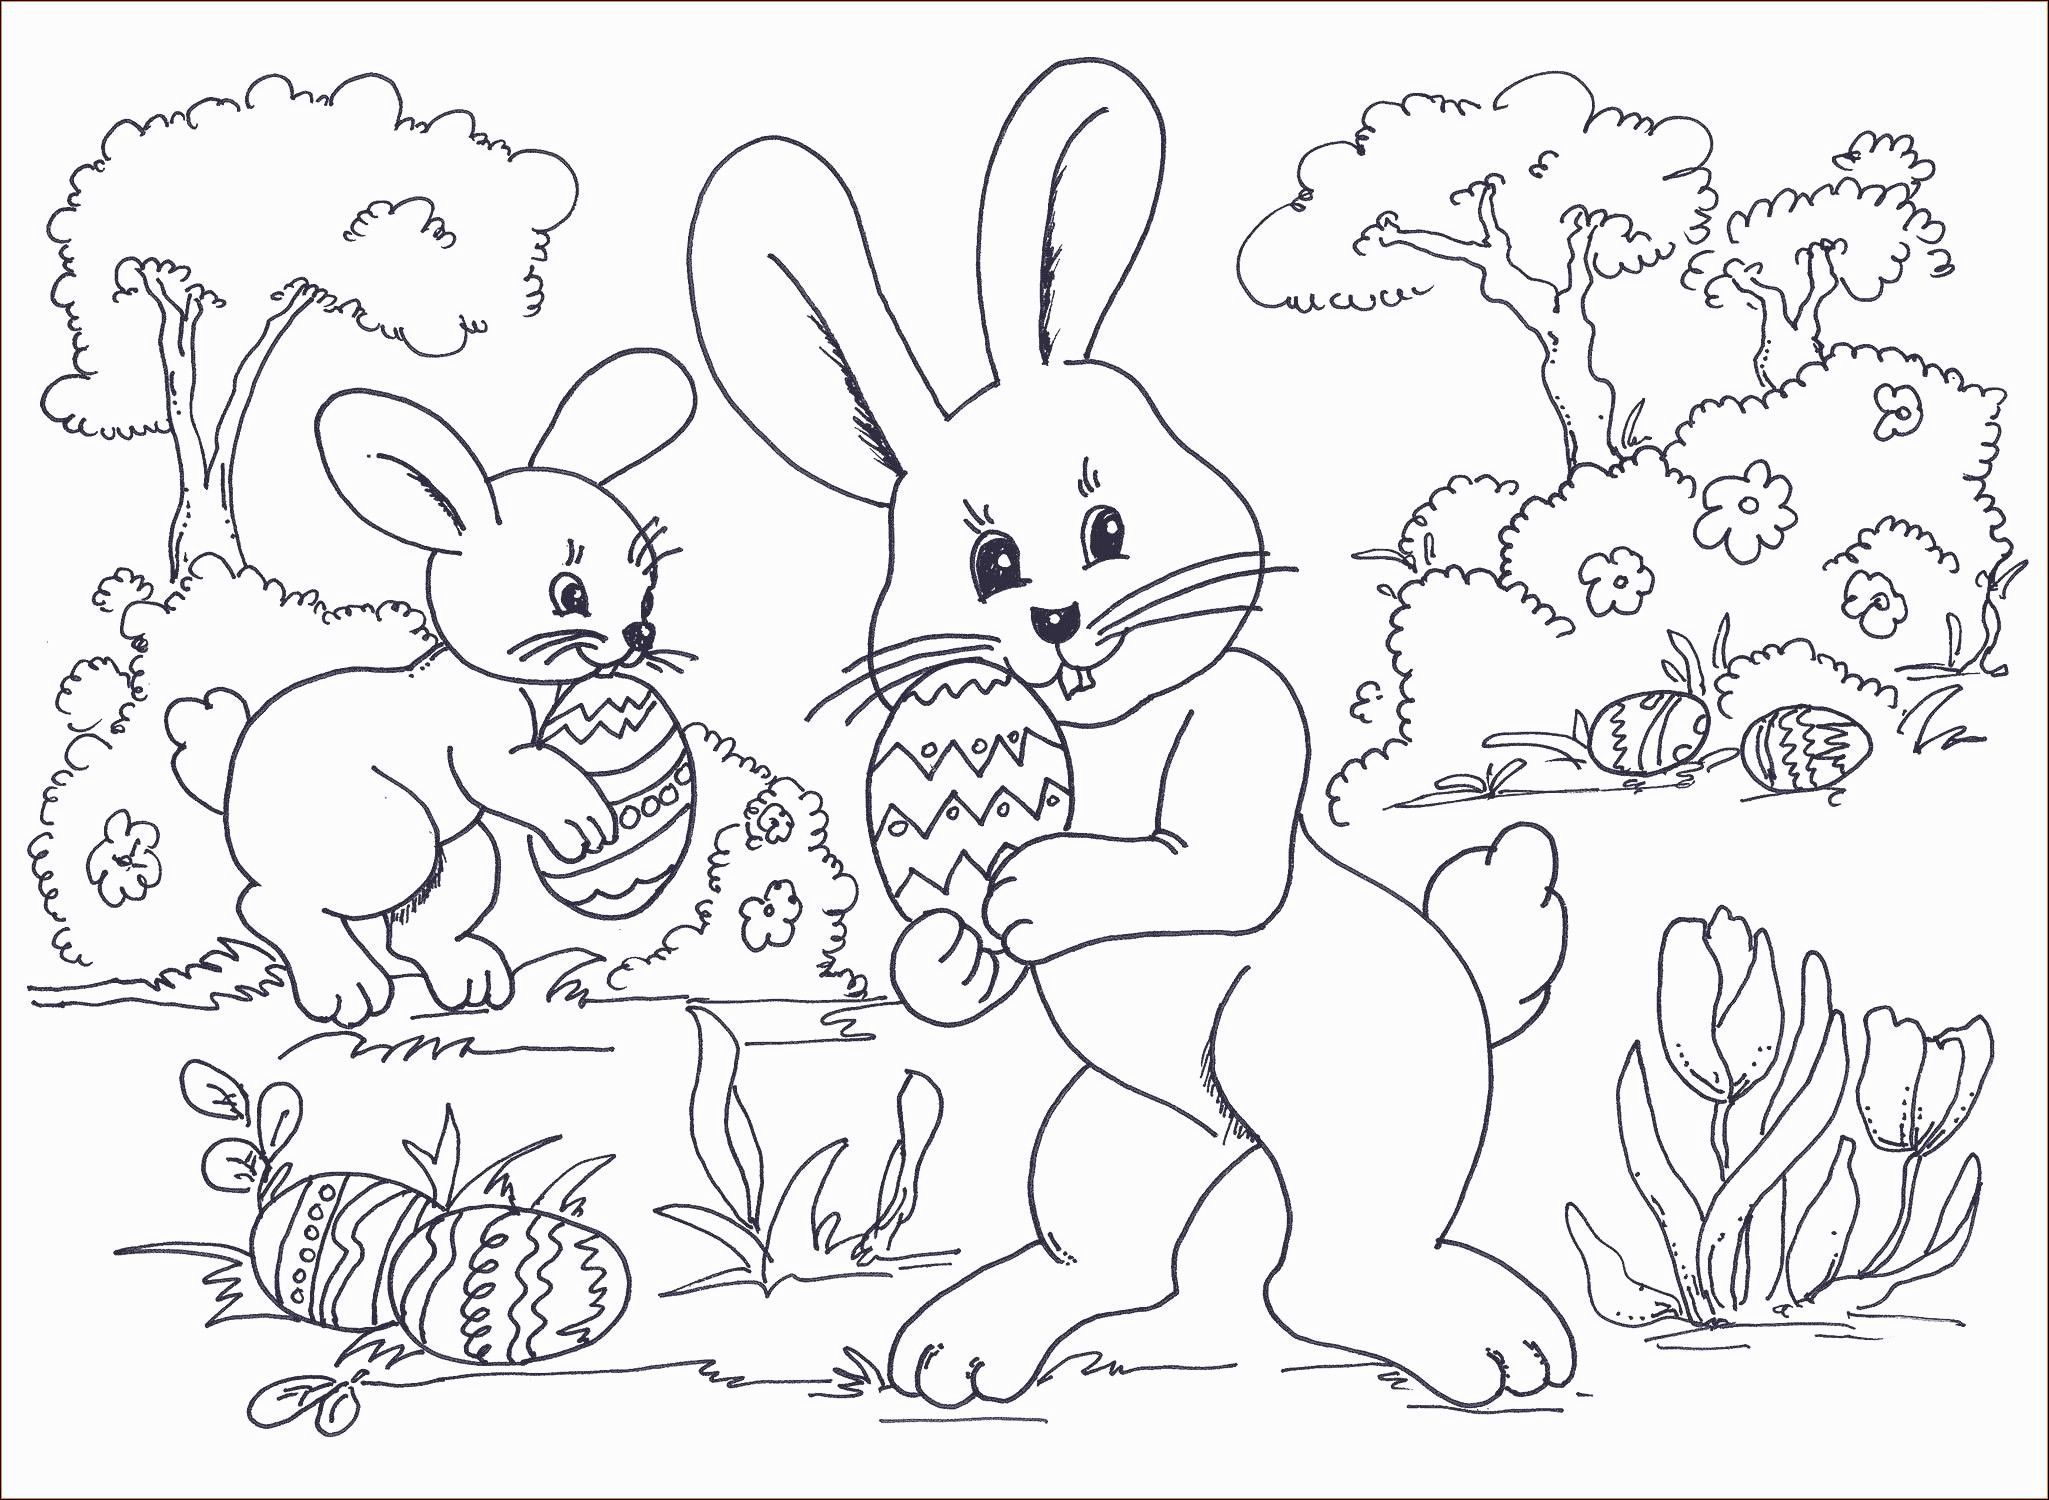 Malvorlagen Fur Kaninchen Bunny Coloring Pages Easter Coloring Pages Easter Coloring Book